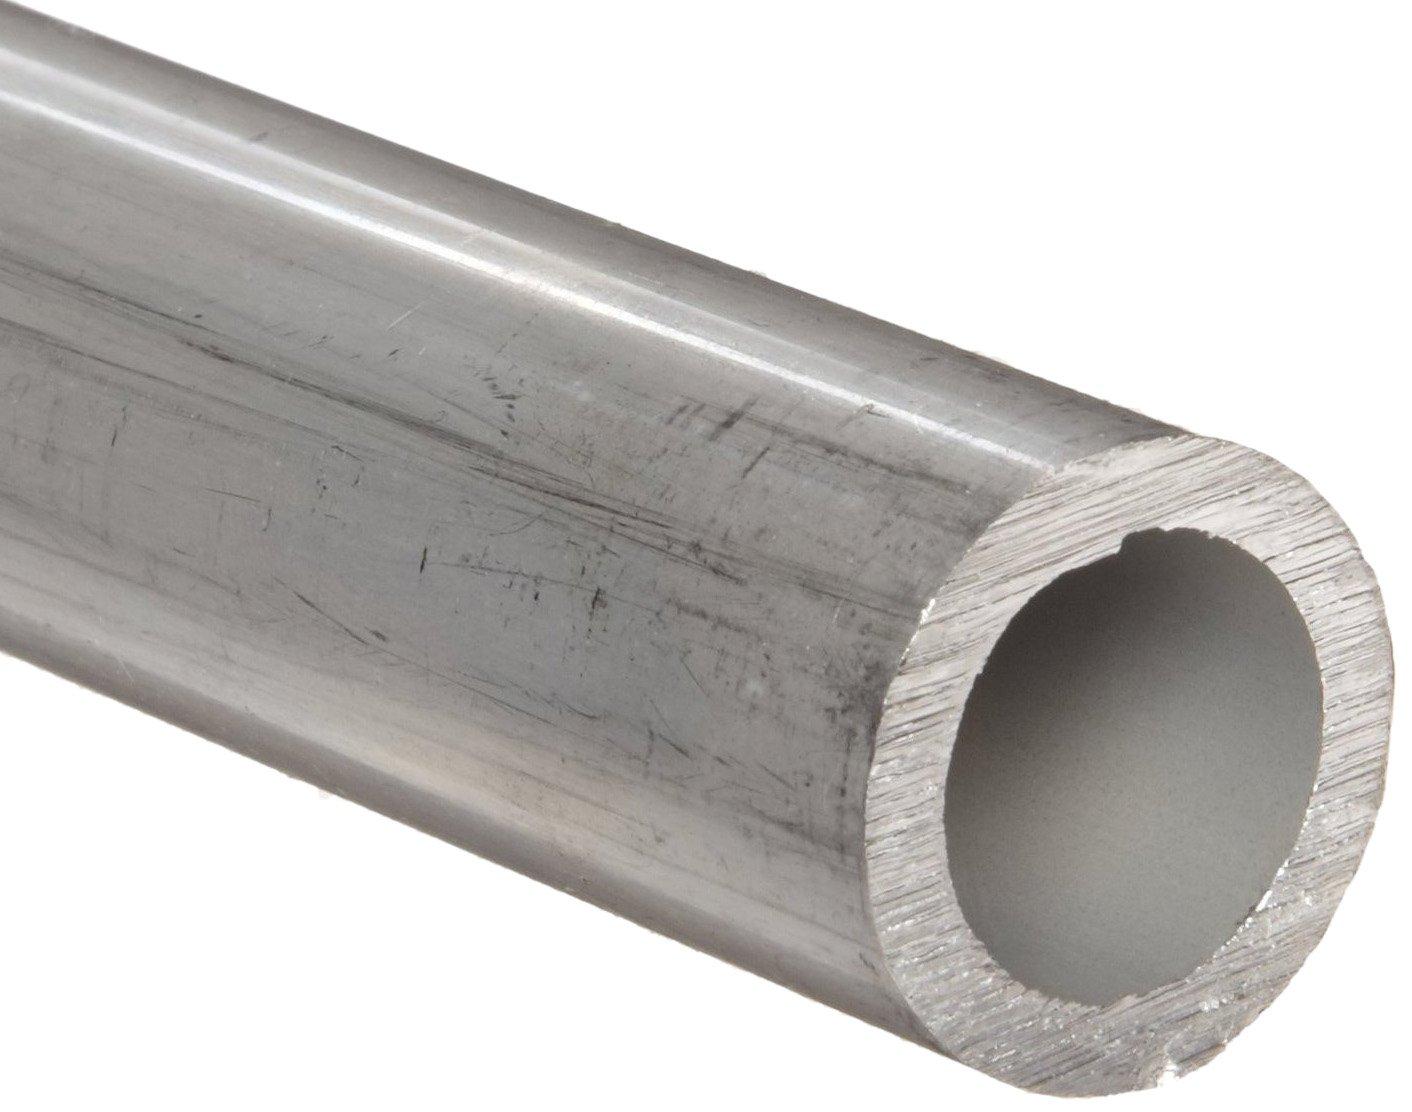 0.12 Wall Aluminum 2024-T3 Seamless Round Tubing WW-T 700//3 1 OD 48 Length 0.76 ID